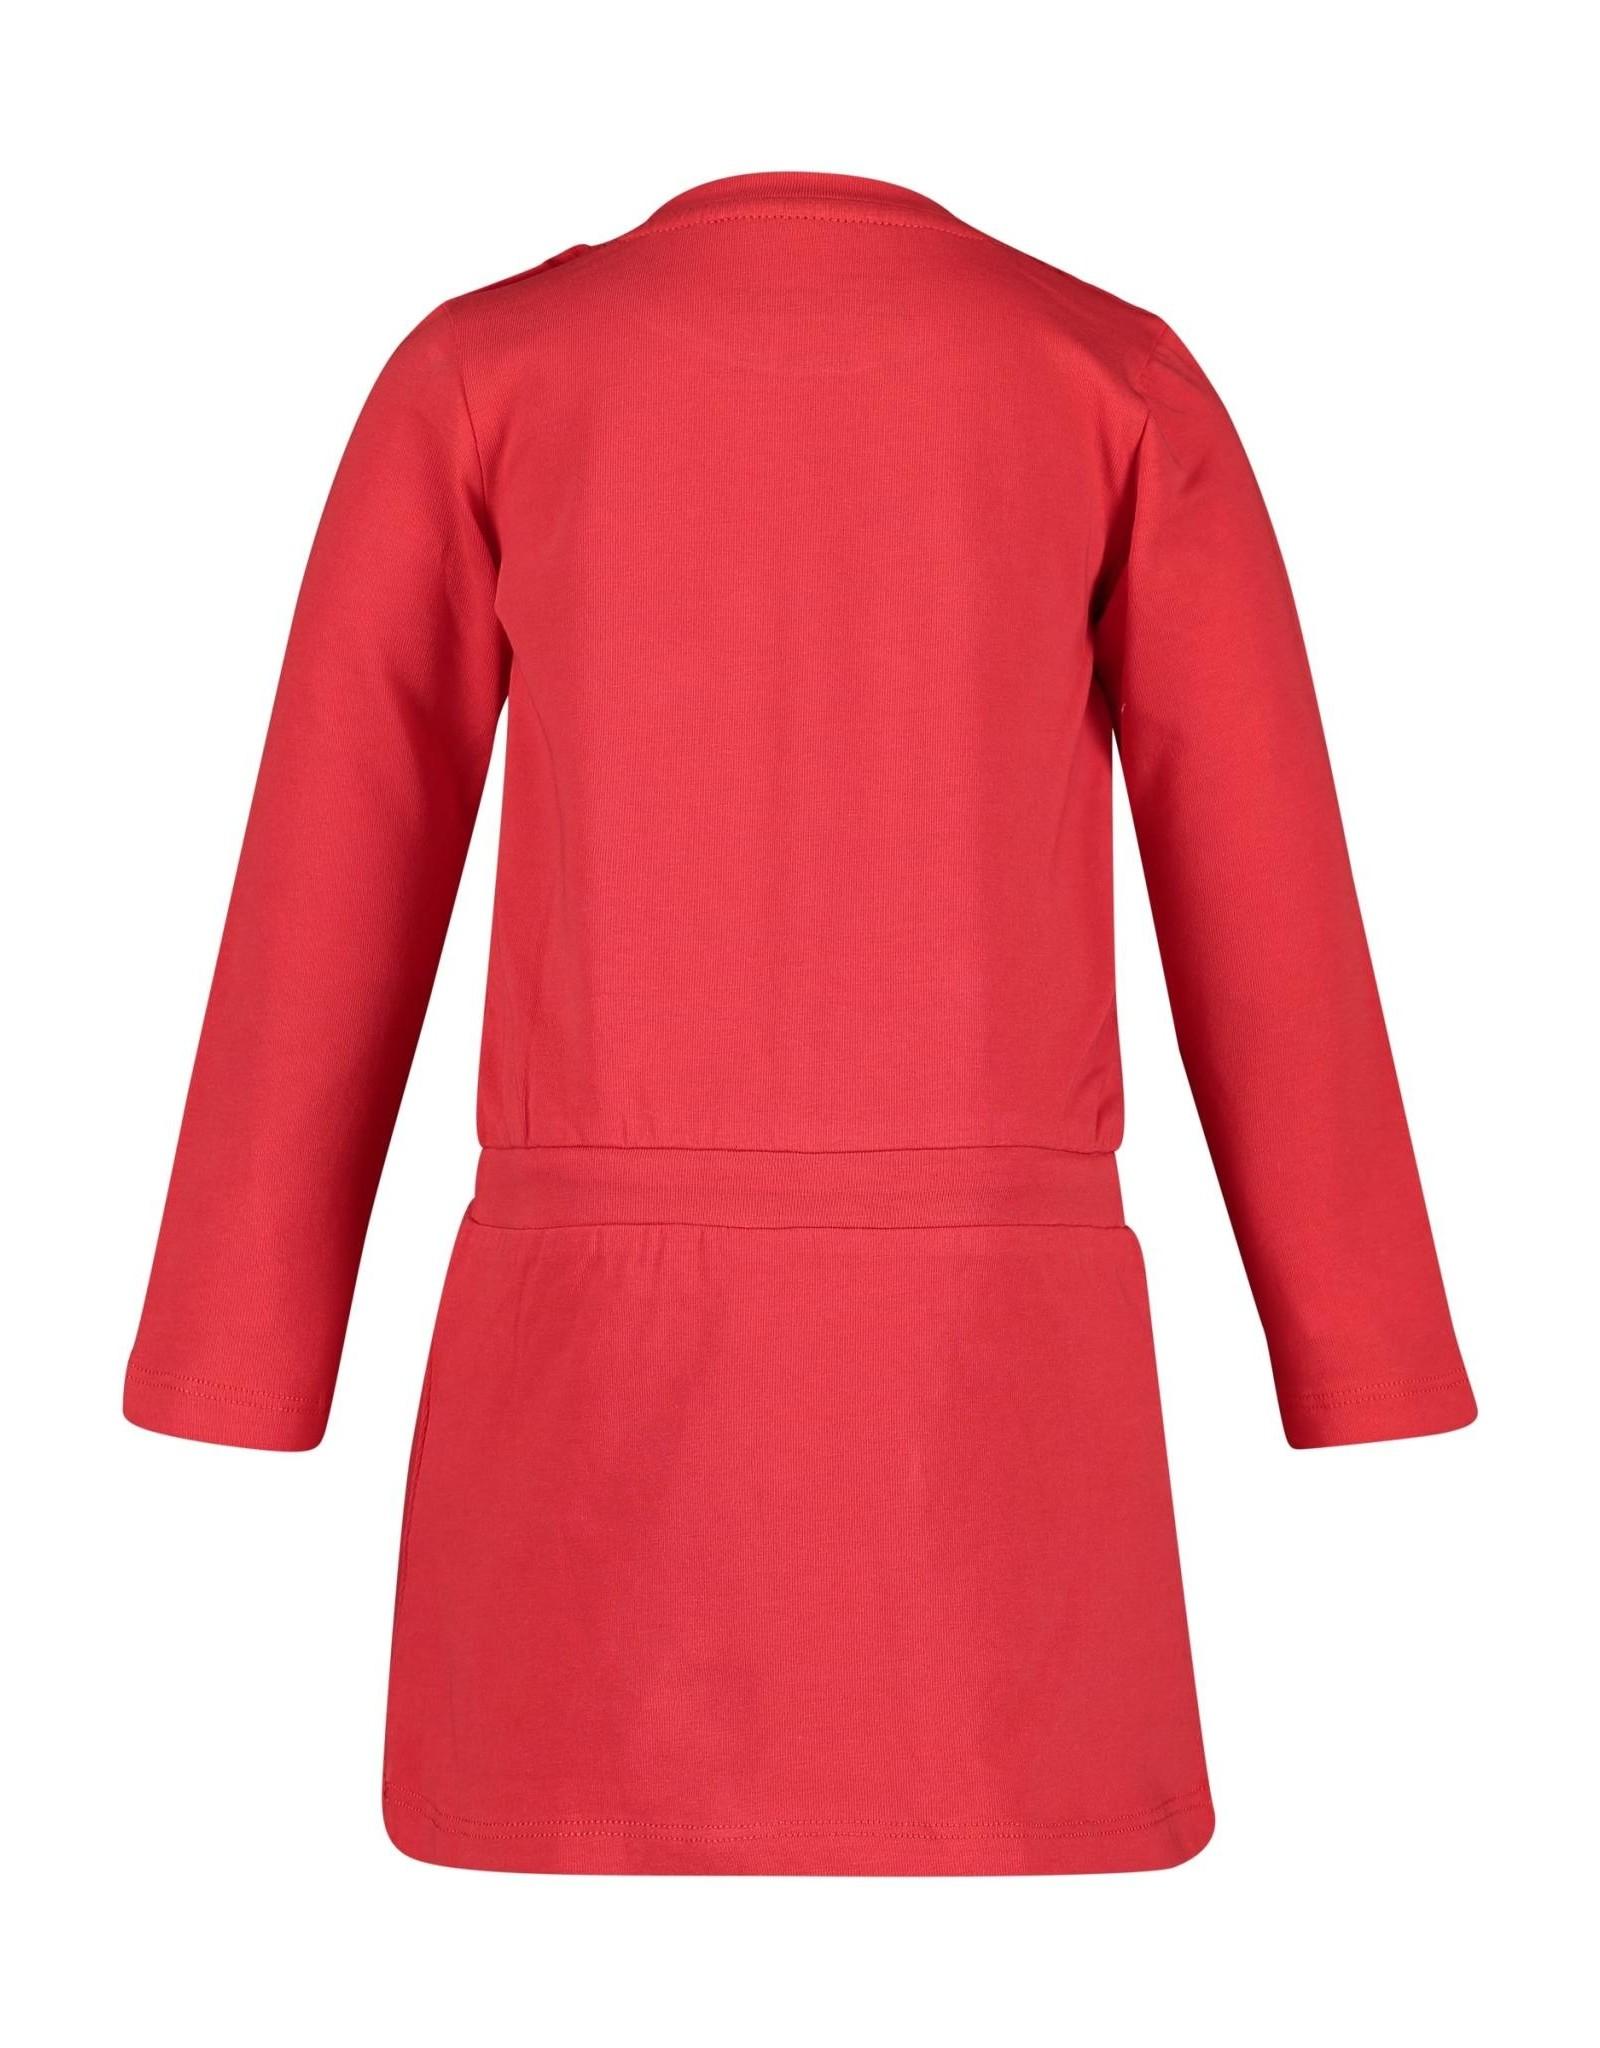 4President 4President meisjes jurk Roos Red